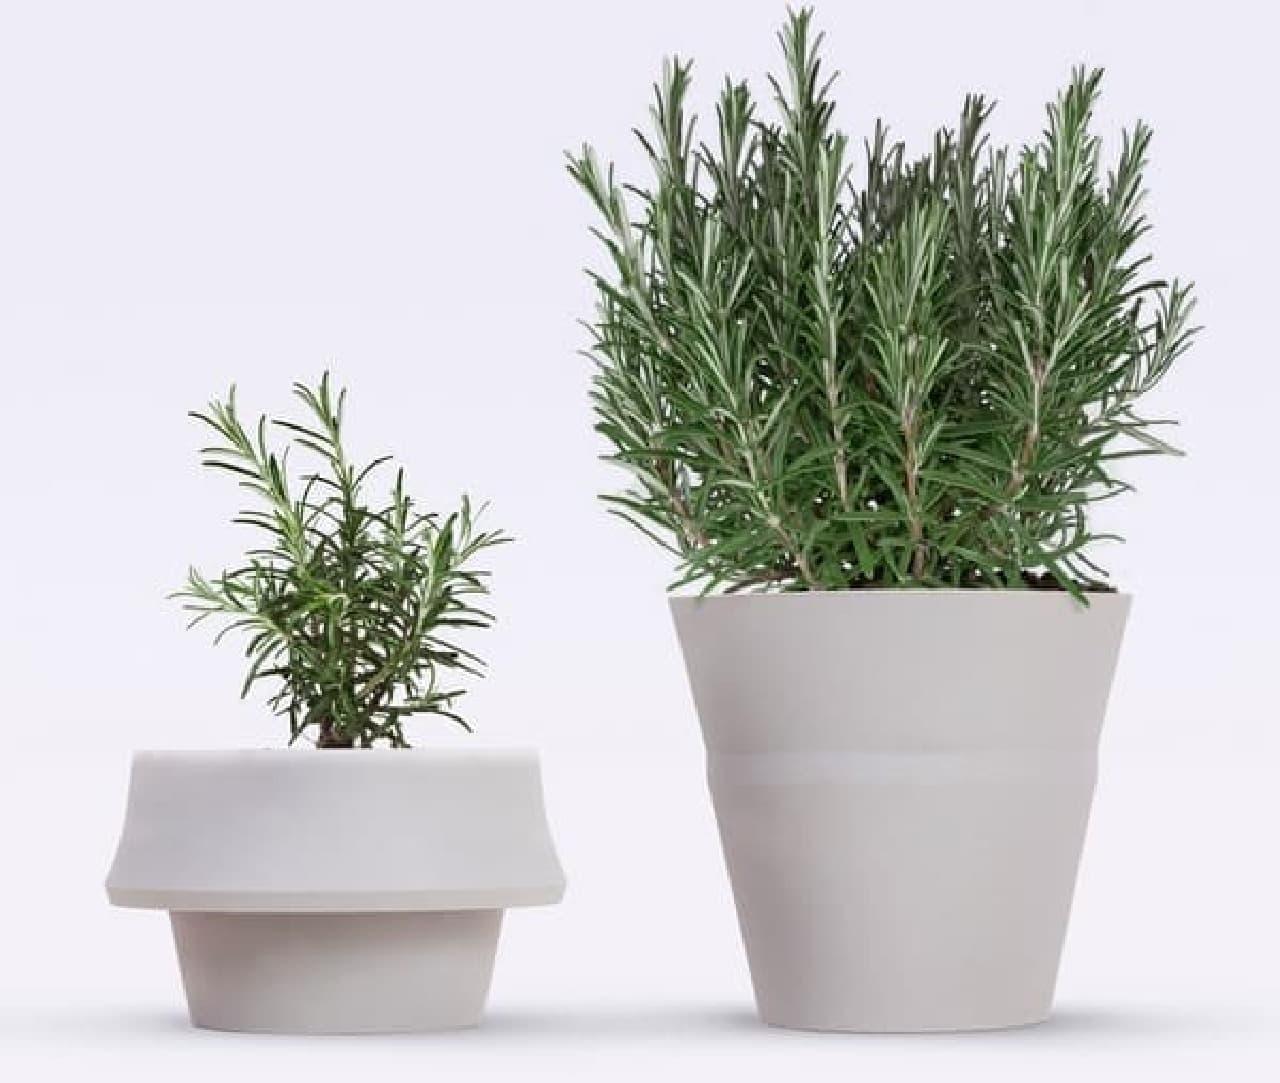 「Fold Pot」はサイズ変更が可能な植木鉢